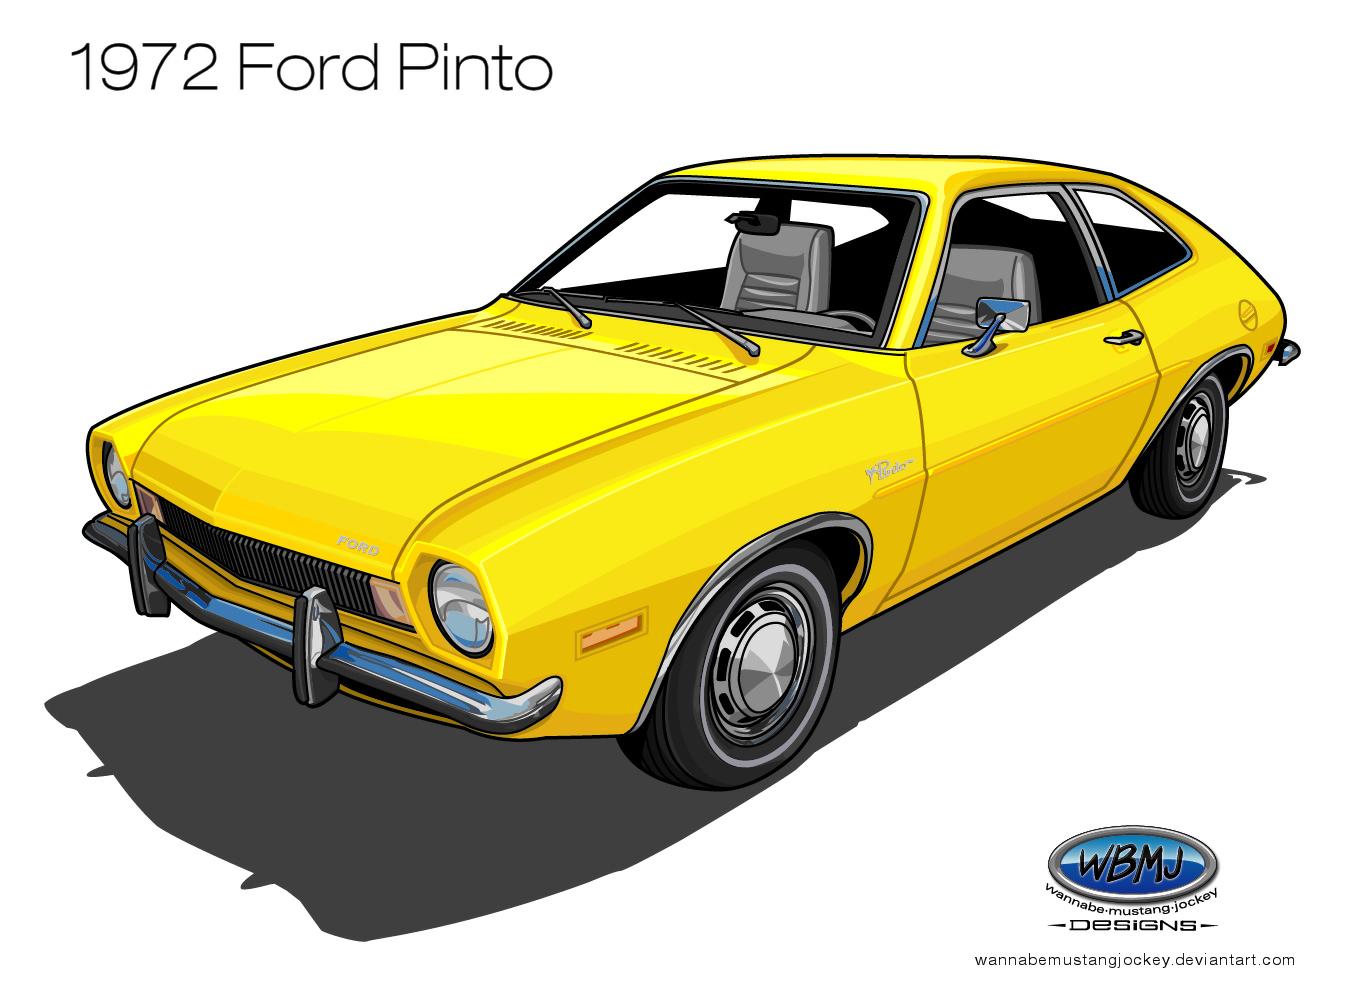 1972 Ford Pinto by wannabemustangjockey